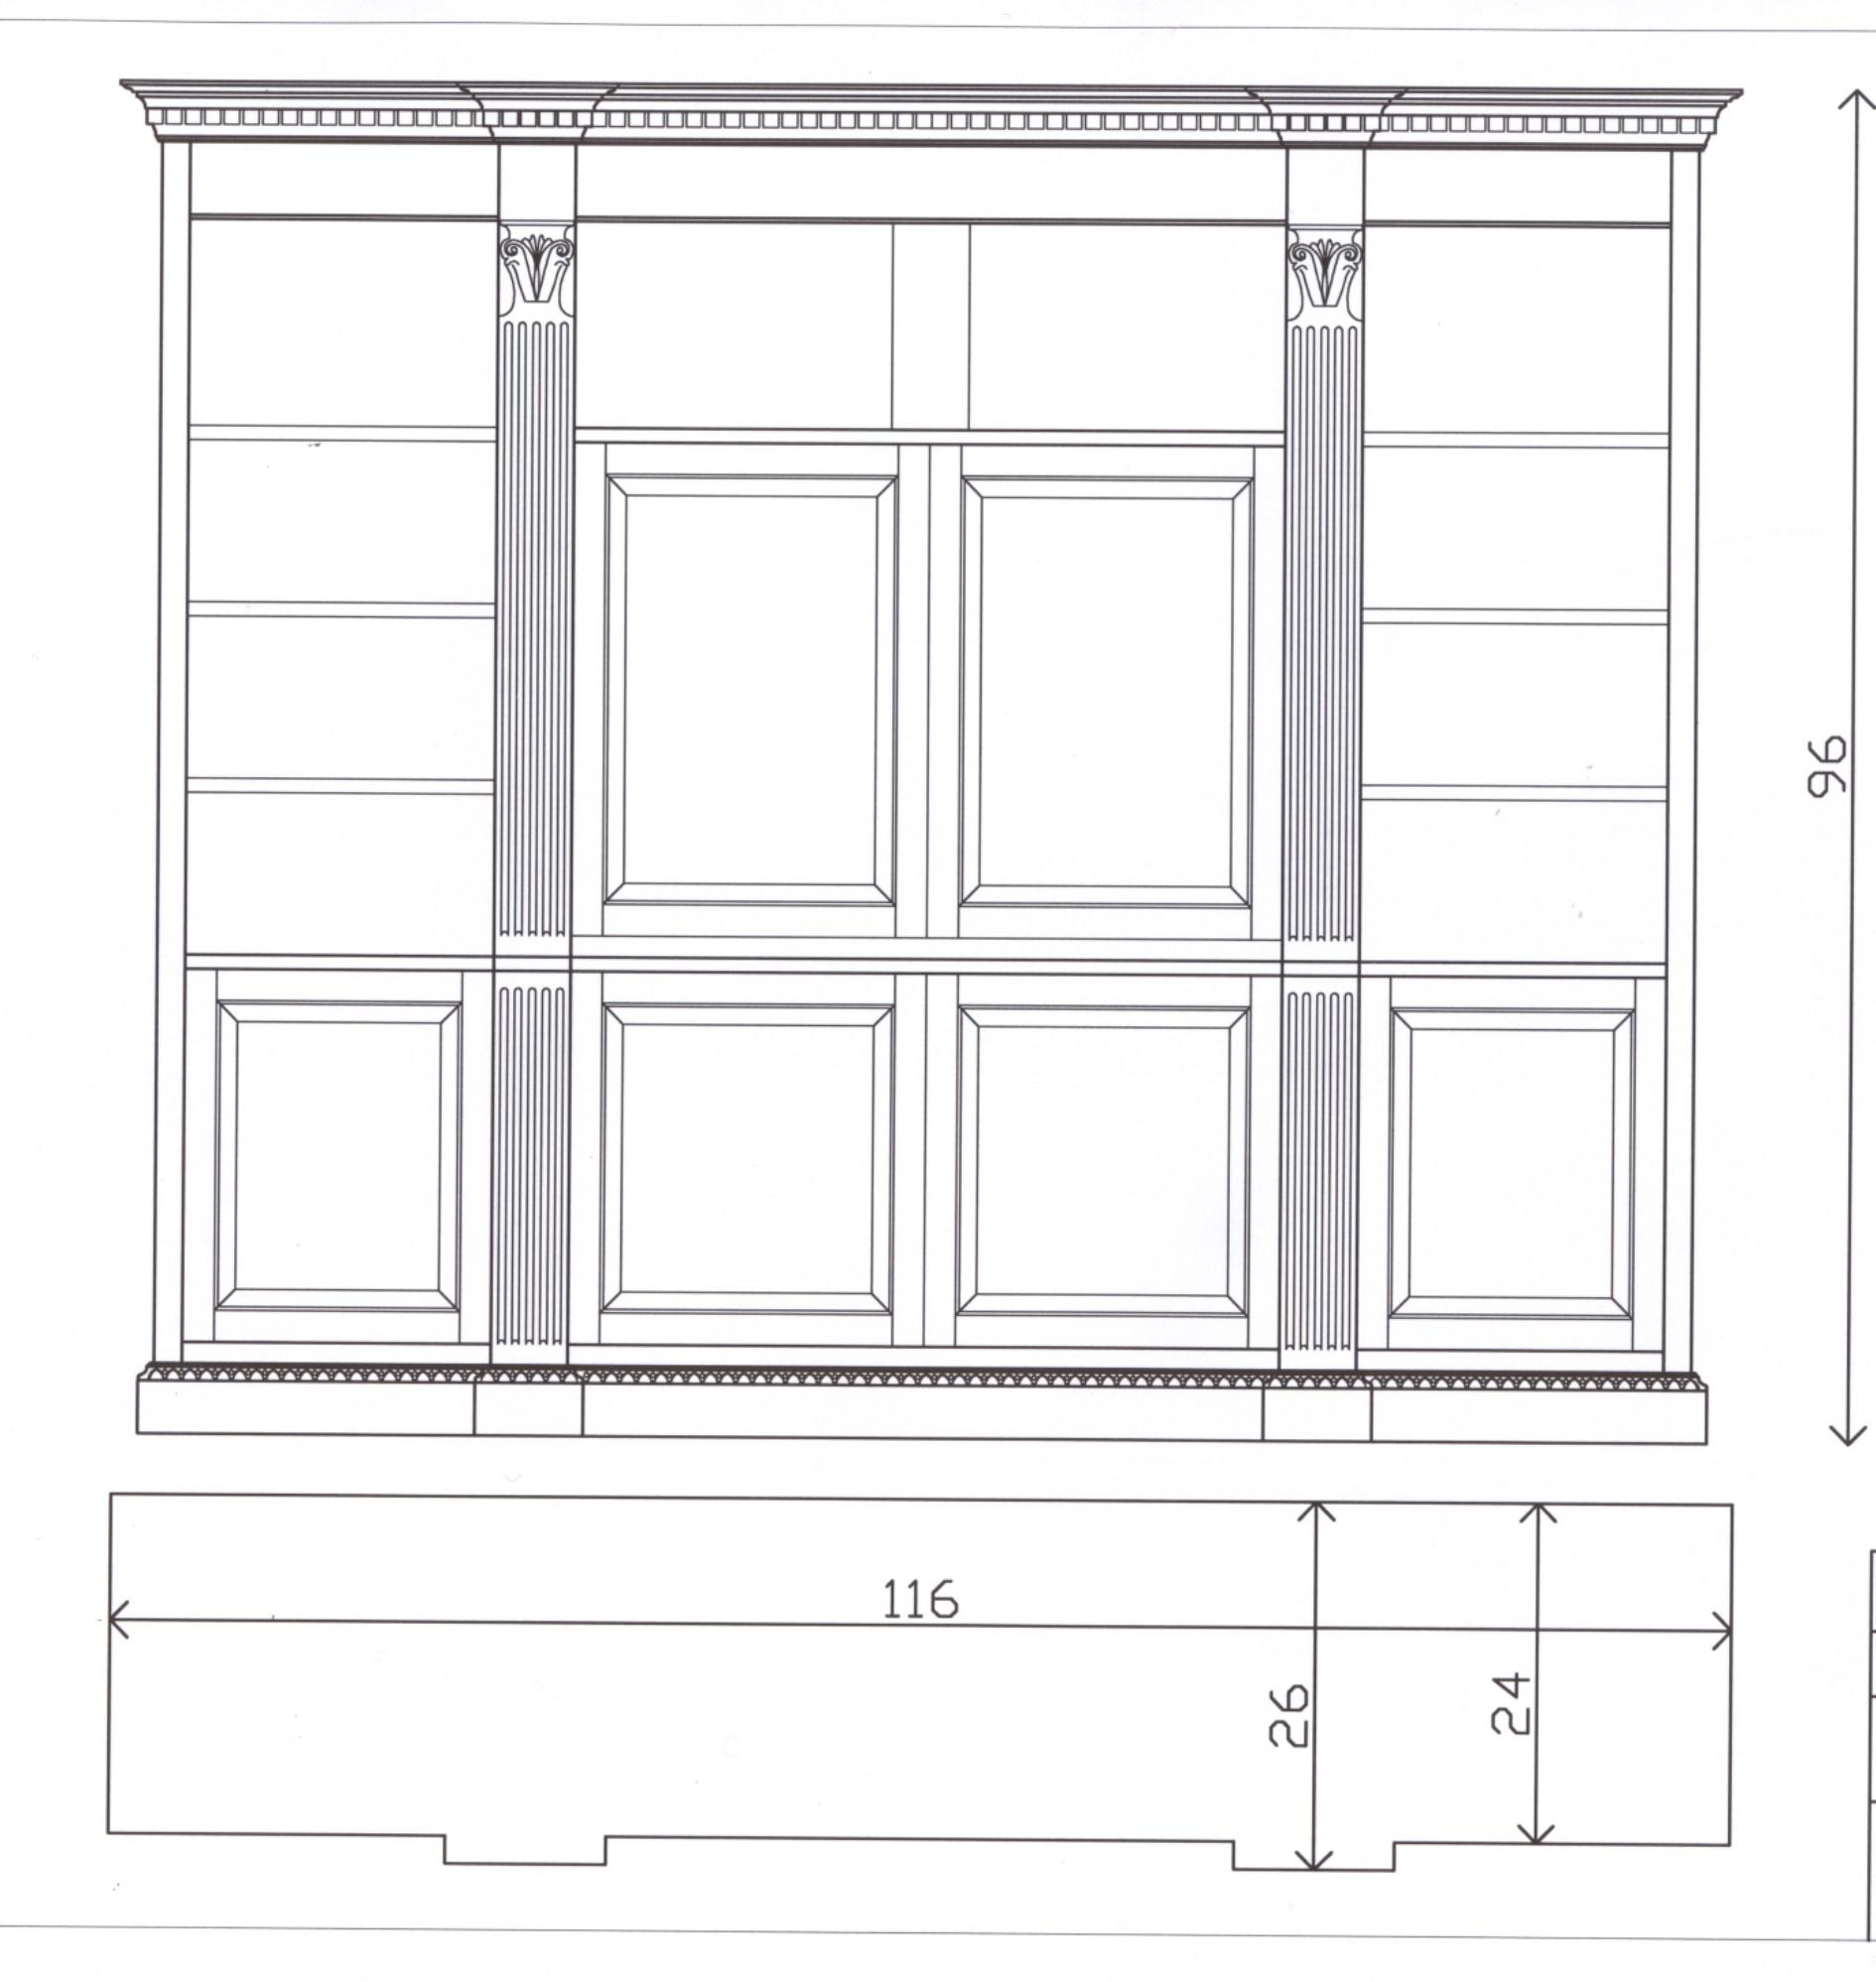 Sketch of a custom bookcase